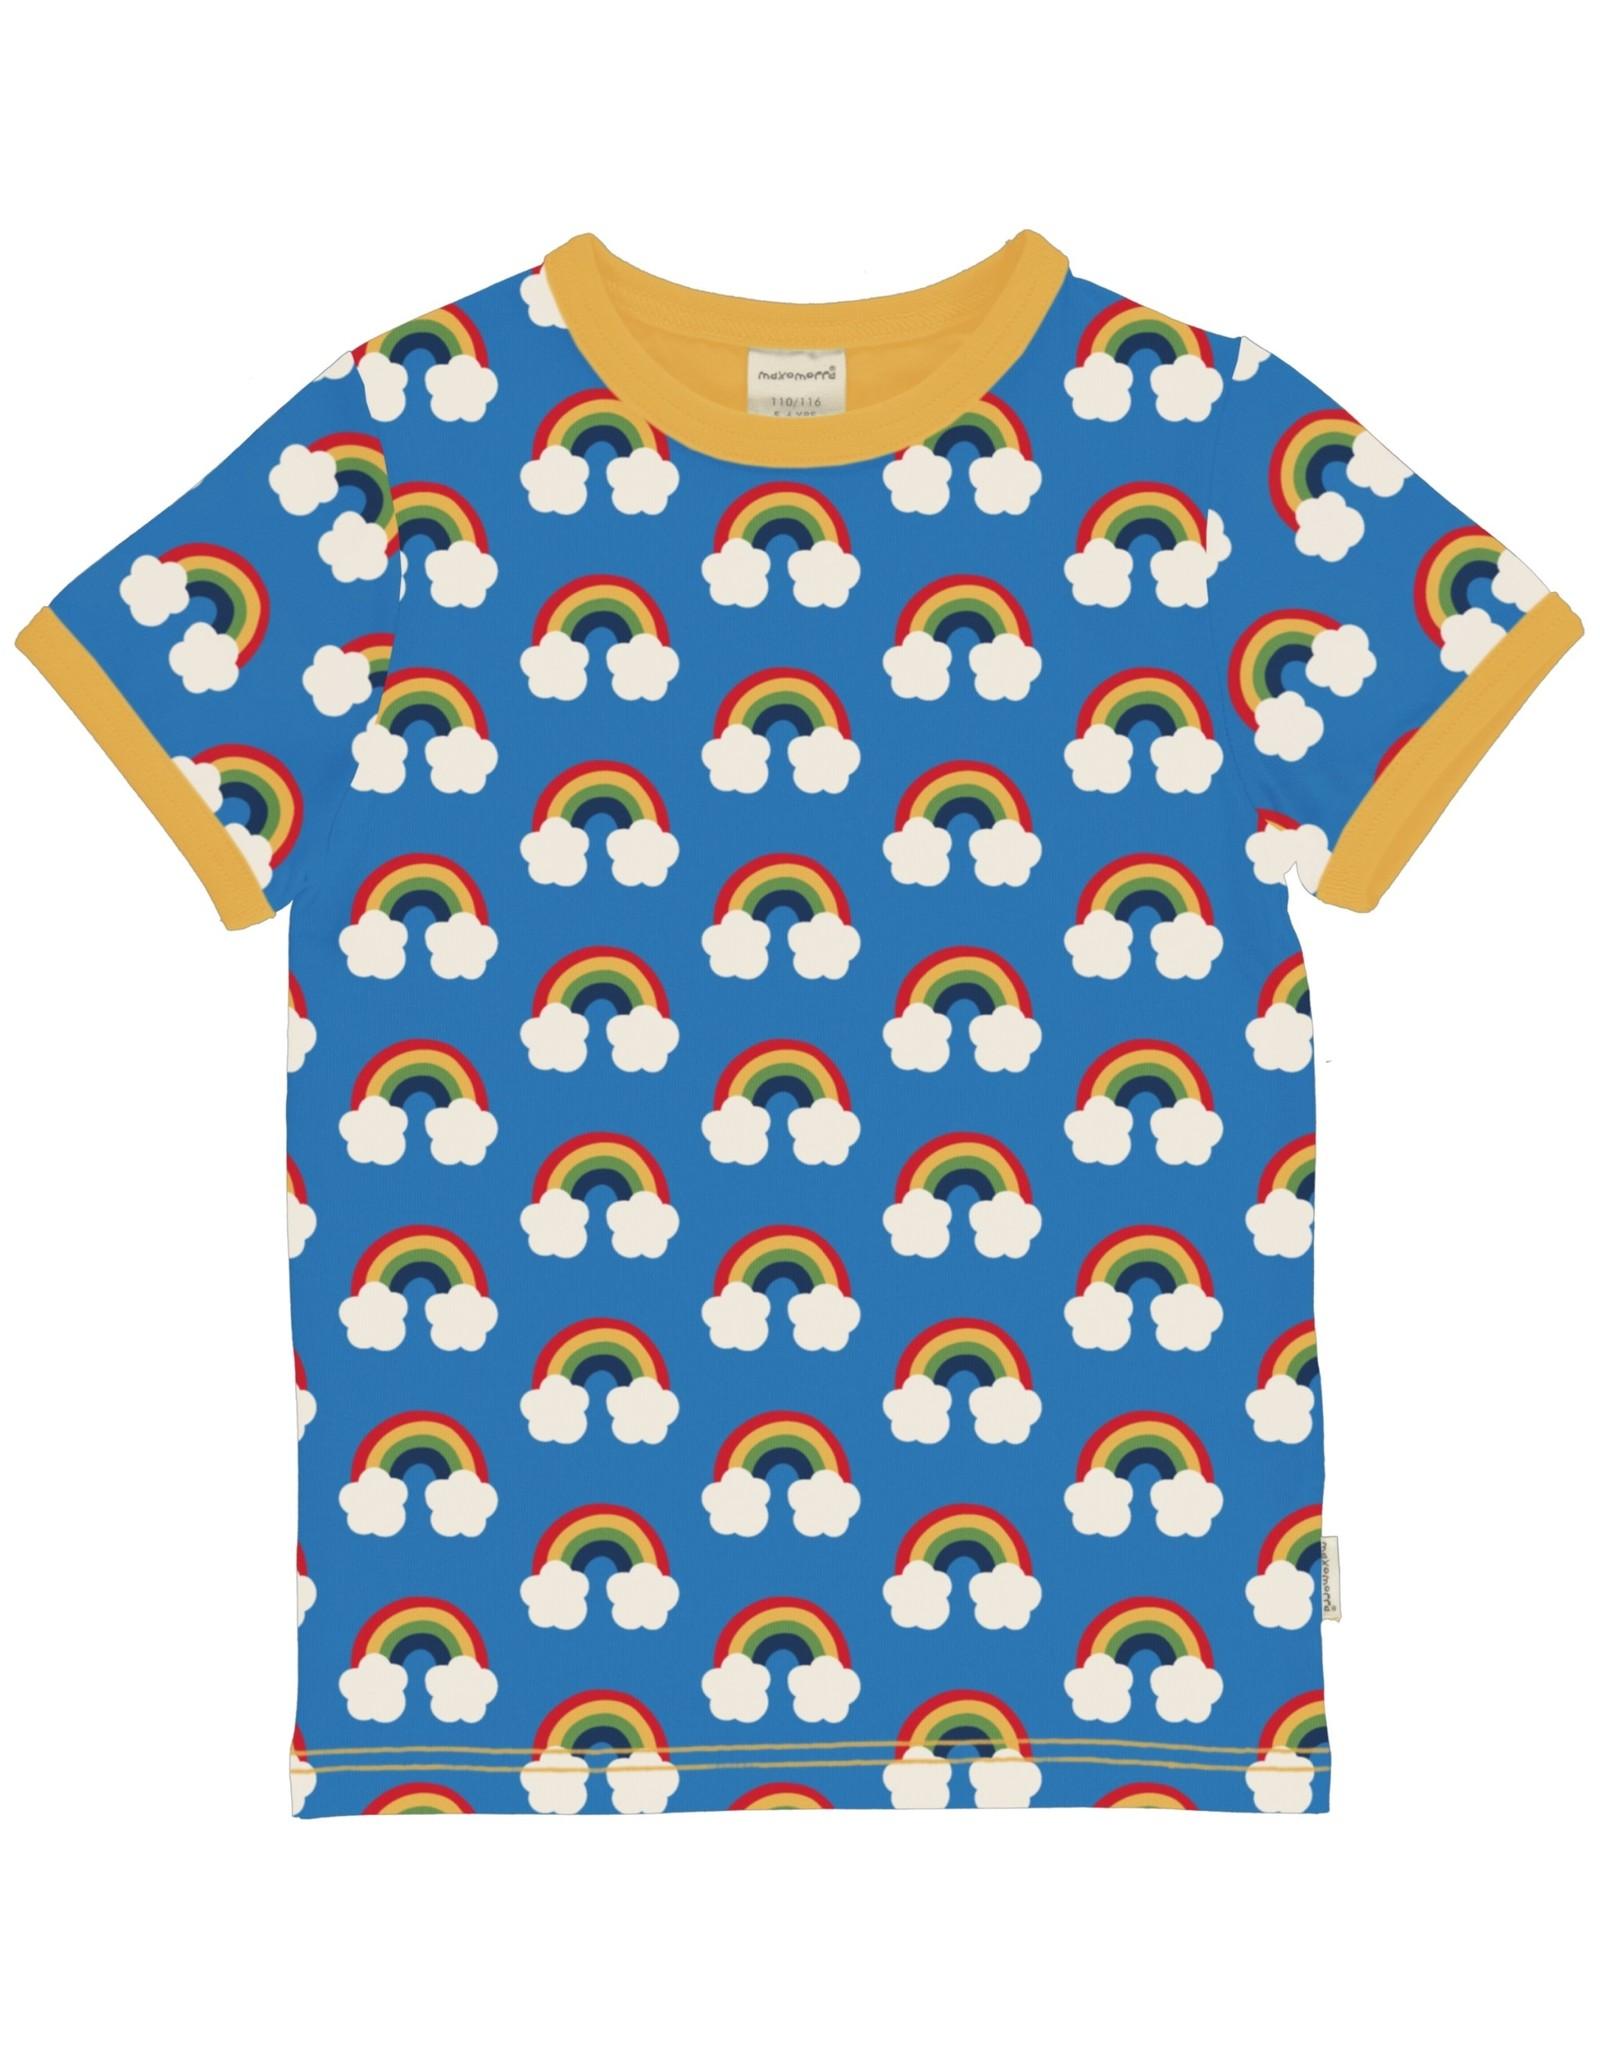 Maxomorra Regenboog t-shirt